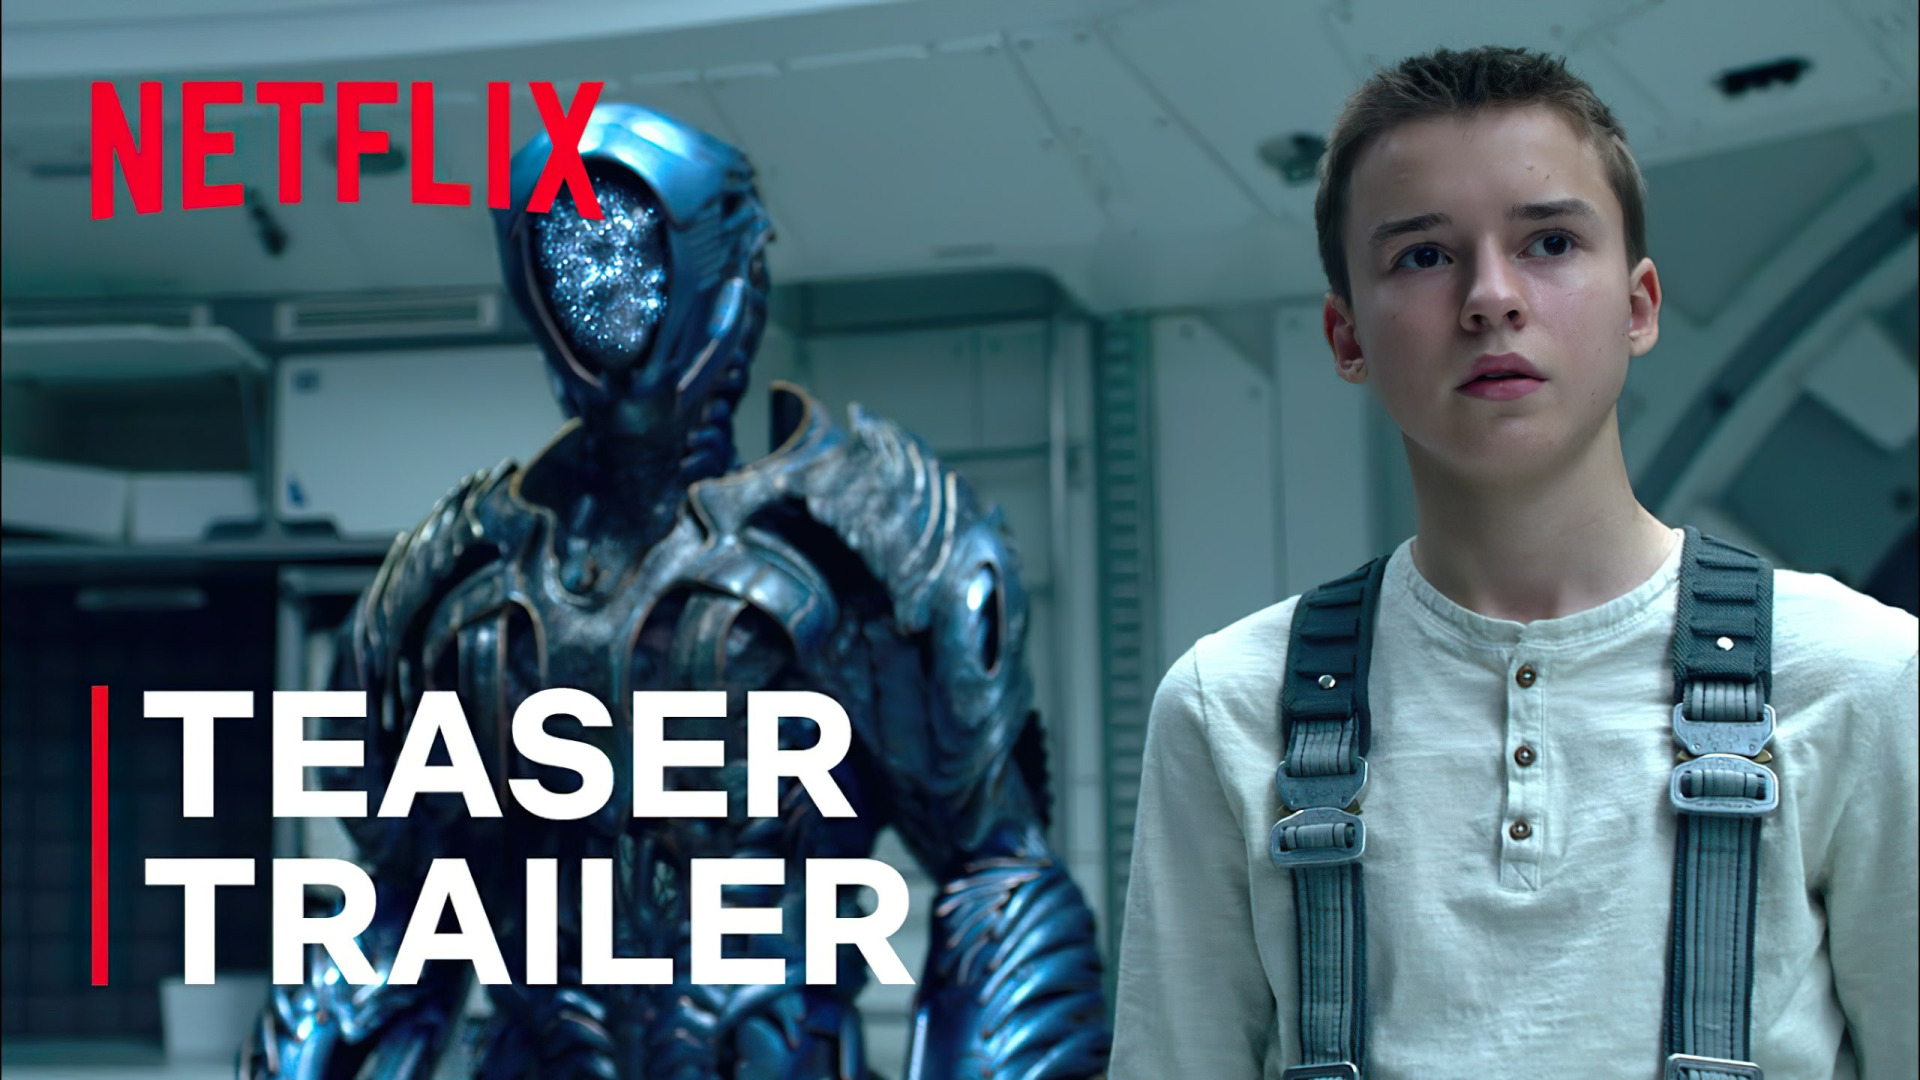 Trailer, Streaming, Netflix, Serie, Serien, Teaser, Science Fiction, Sci-Fi, Lost in Space